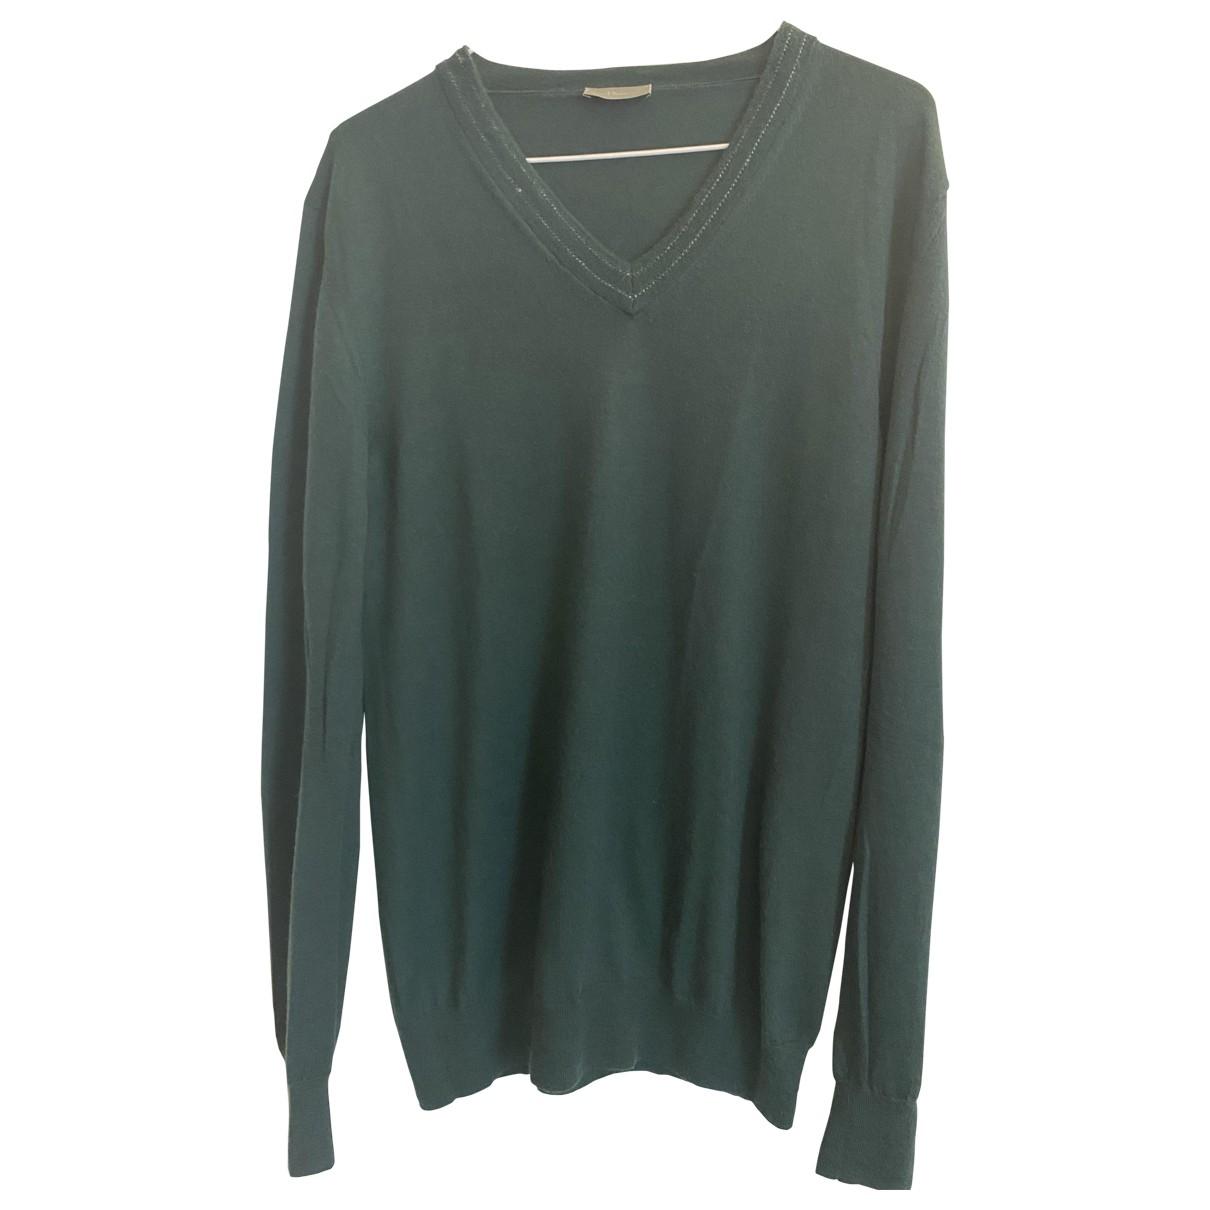 Dior Homme \N Green Cashmere Knitwear & Sweatshirts for Men M International